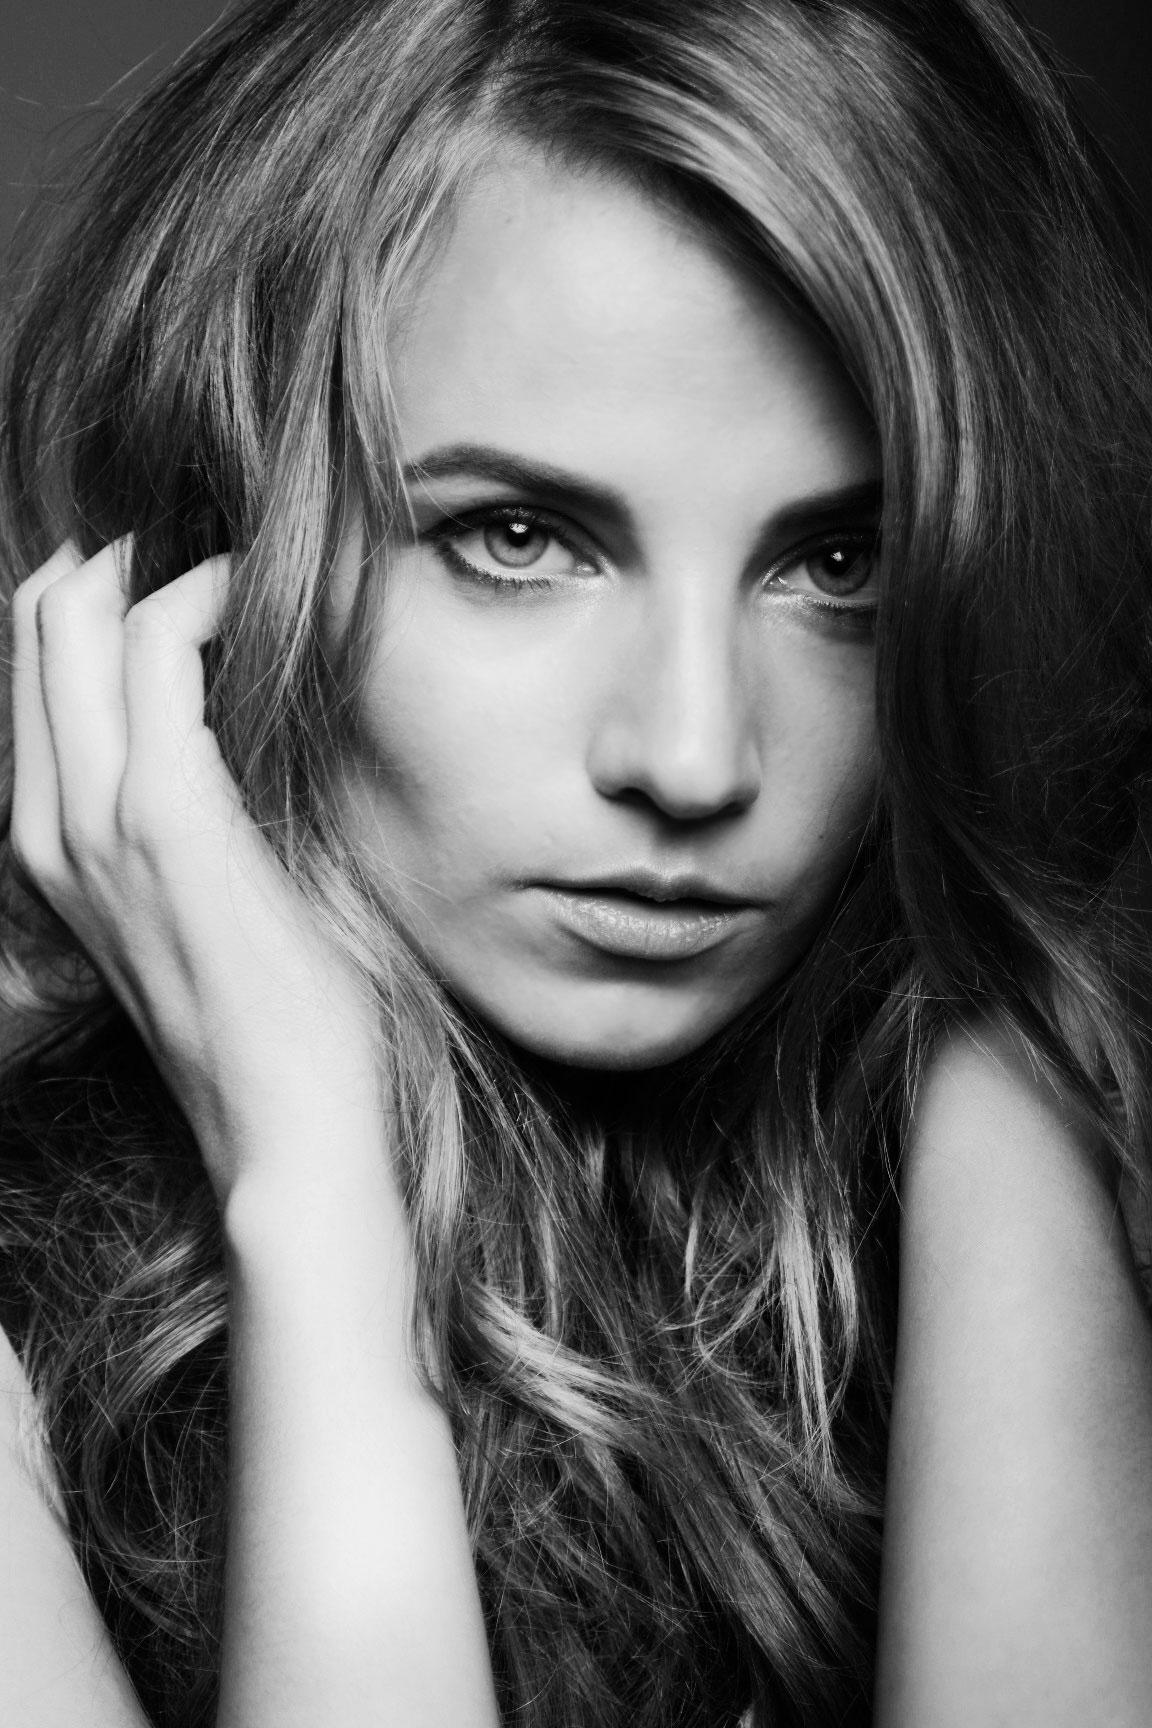 Nadia Murgasova